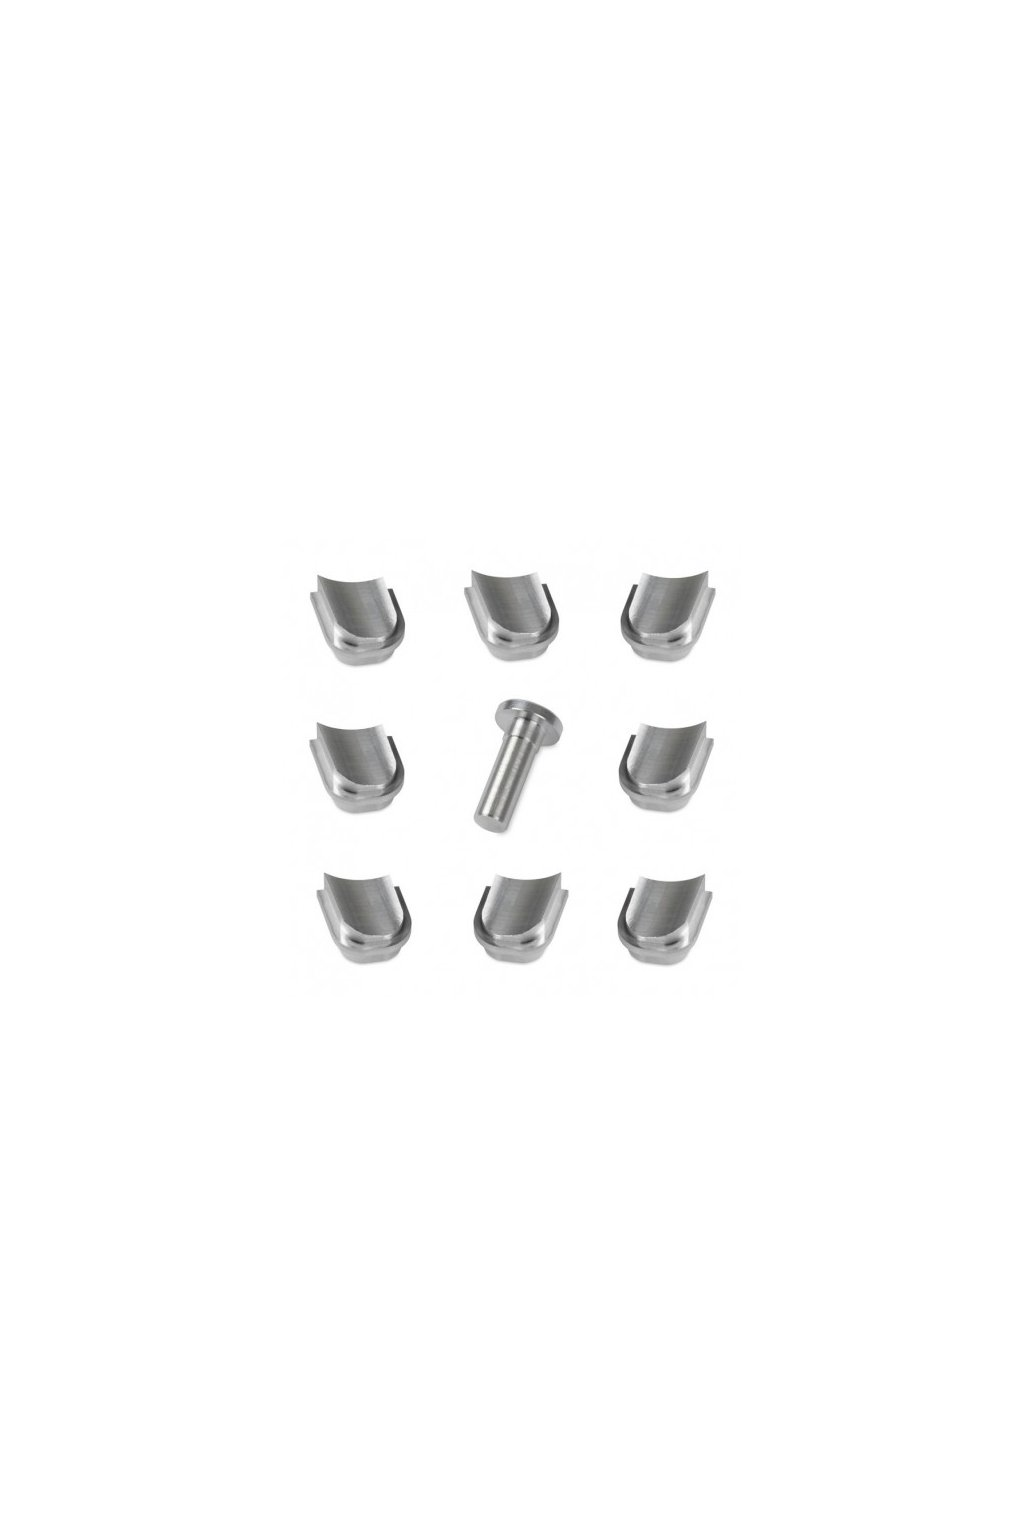 rfd 20 tfsi ea113 kit odstraneni virivych klapek